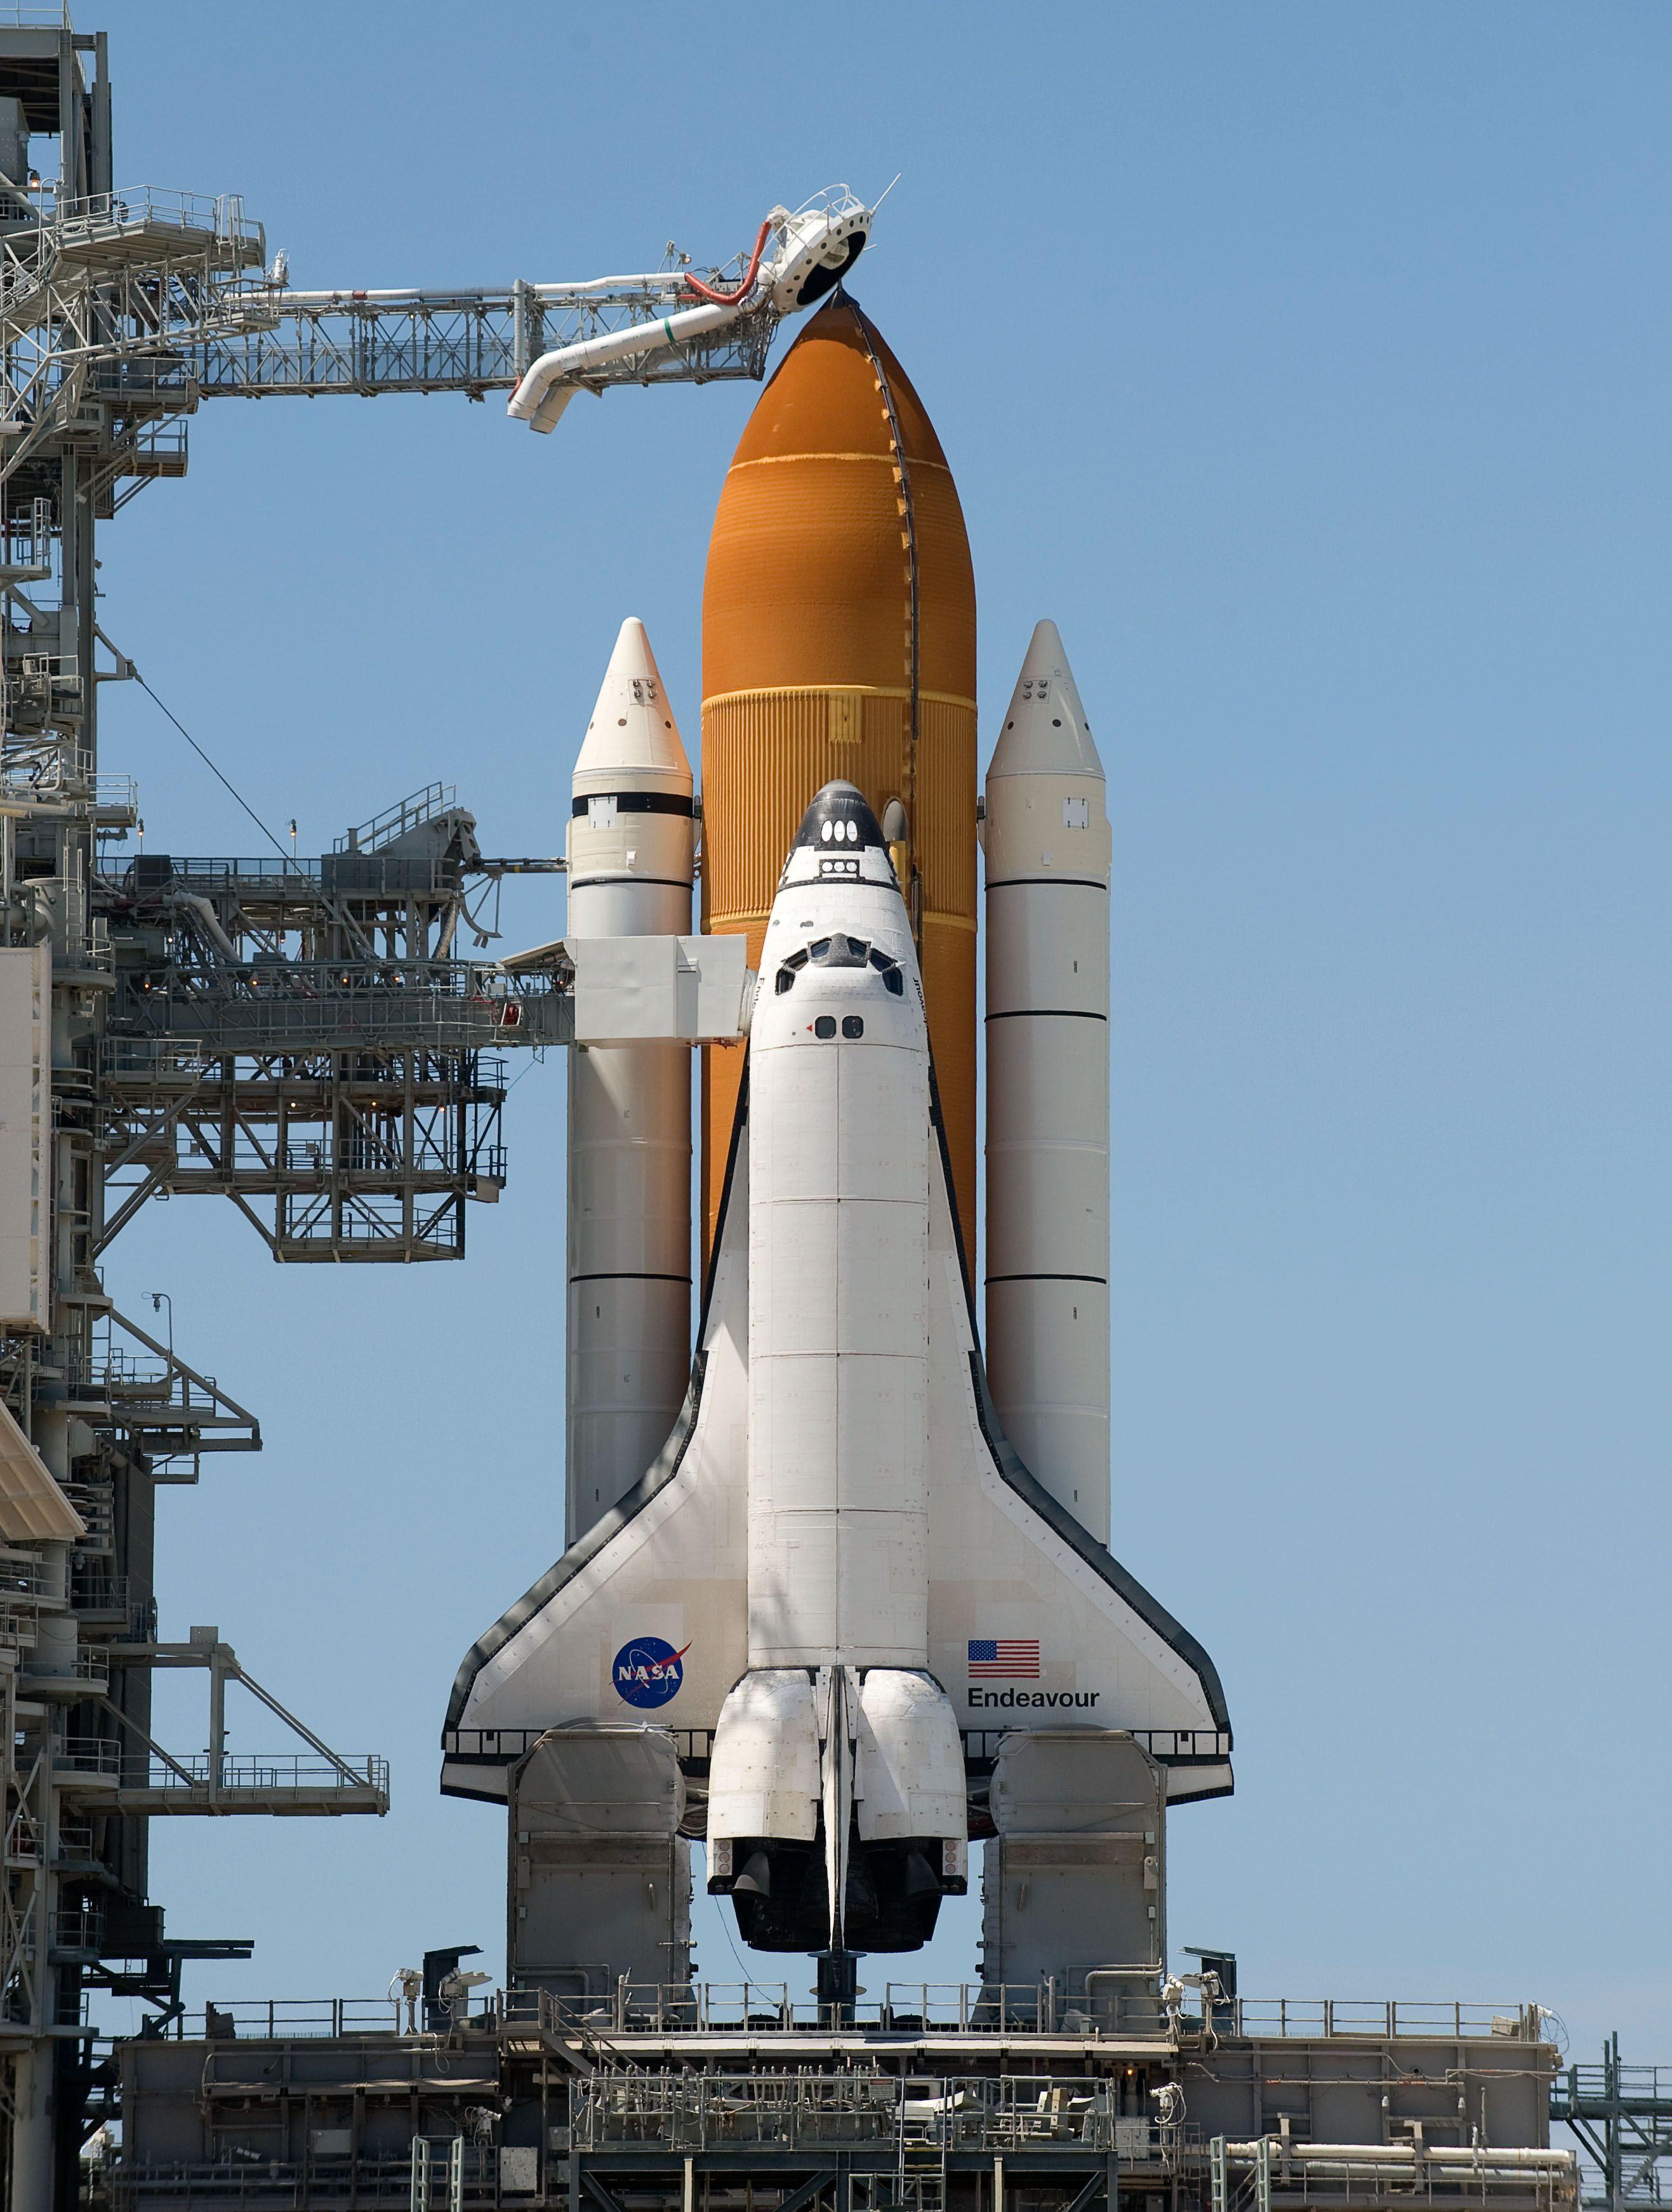 space shuttle grid - photo #39